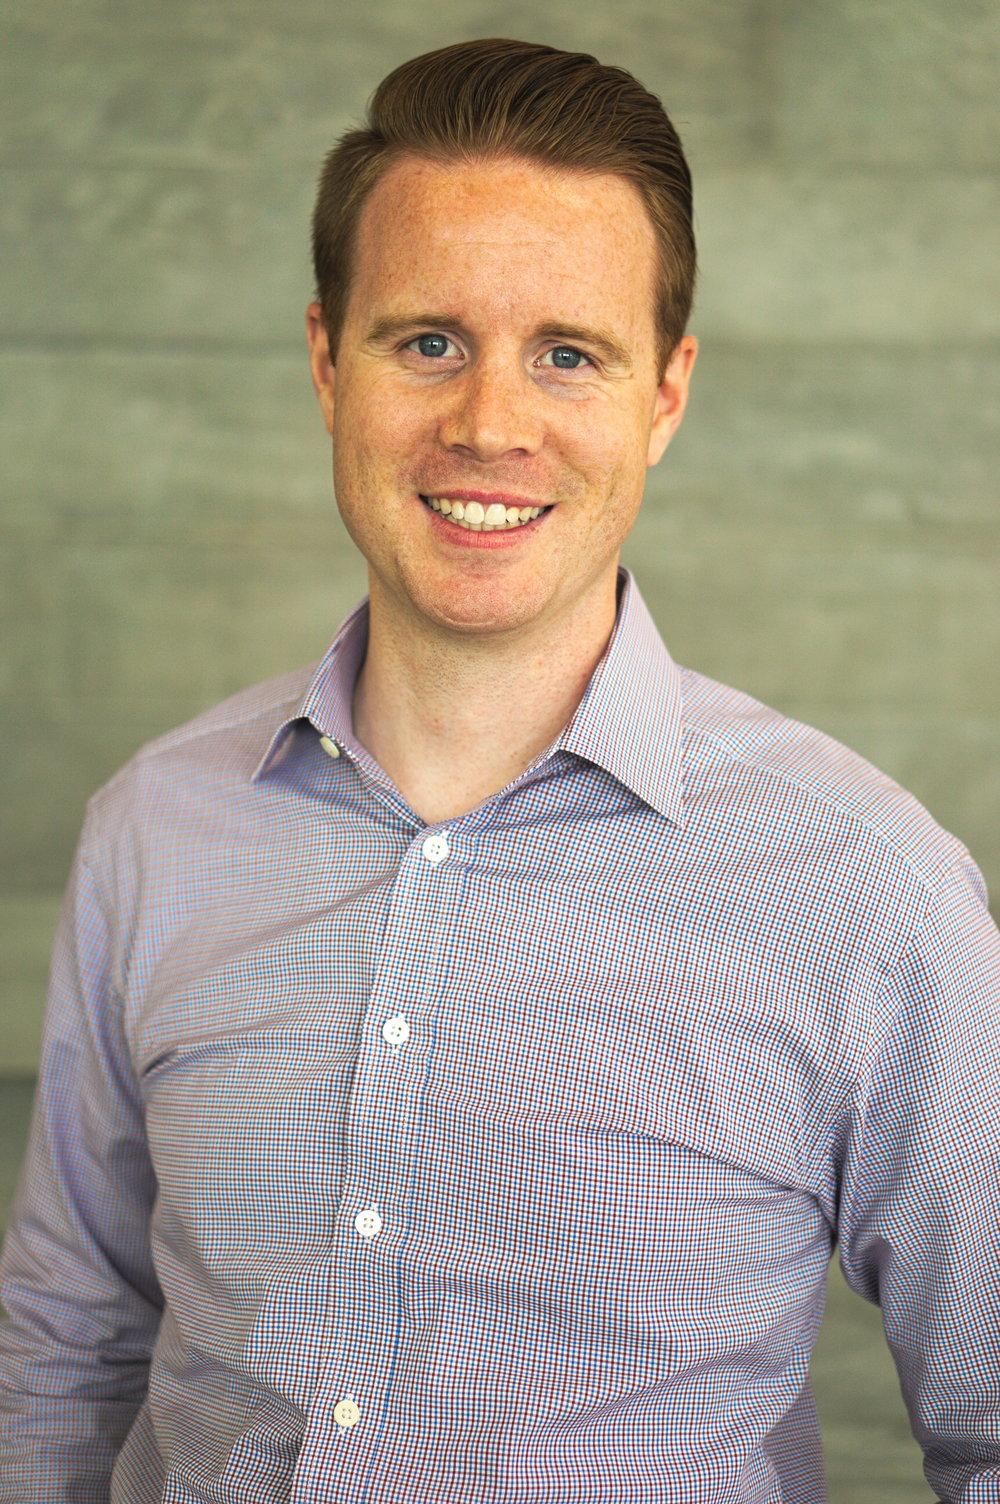 Aaron Eddy - Vice President